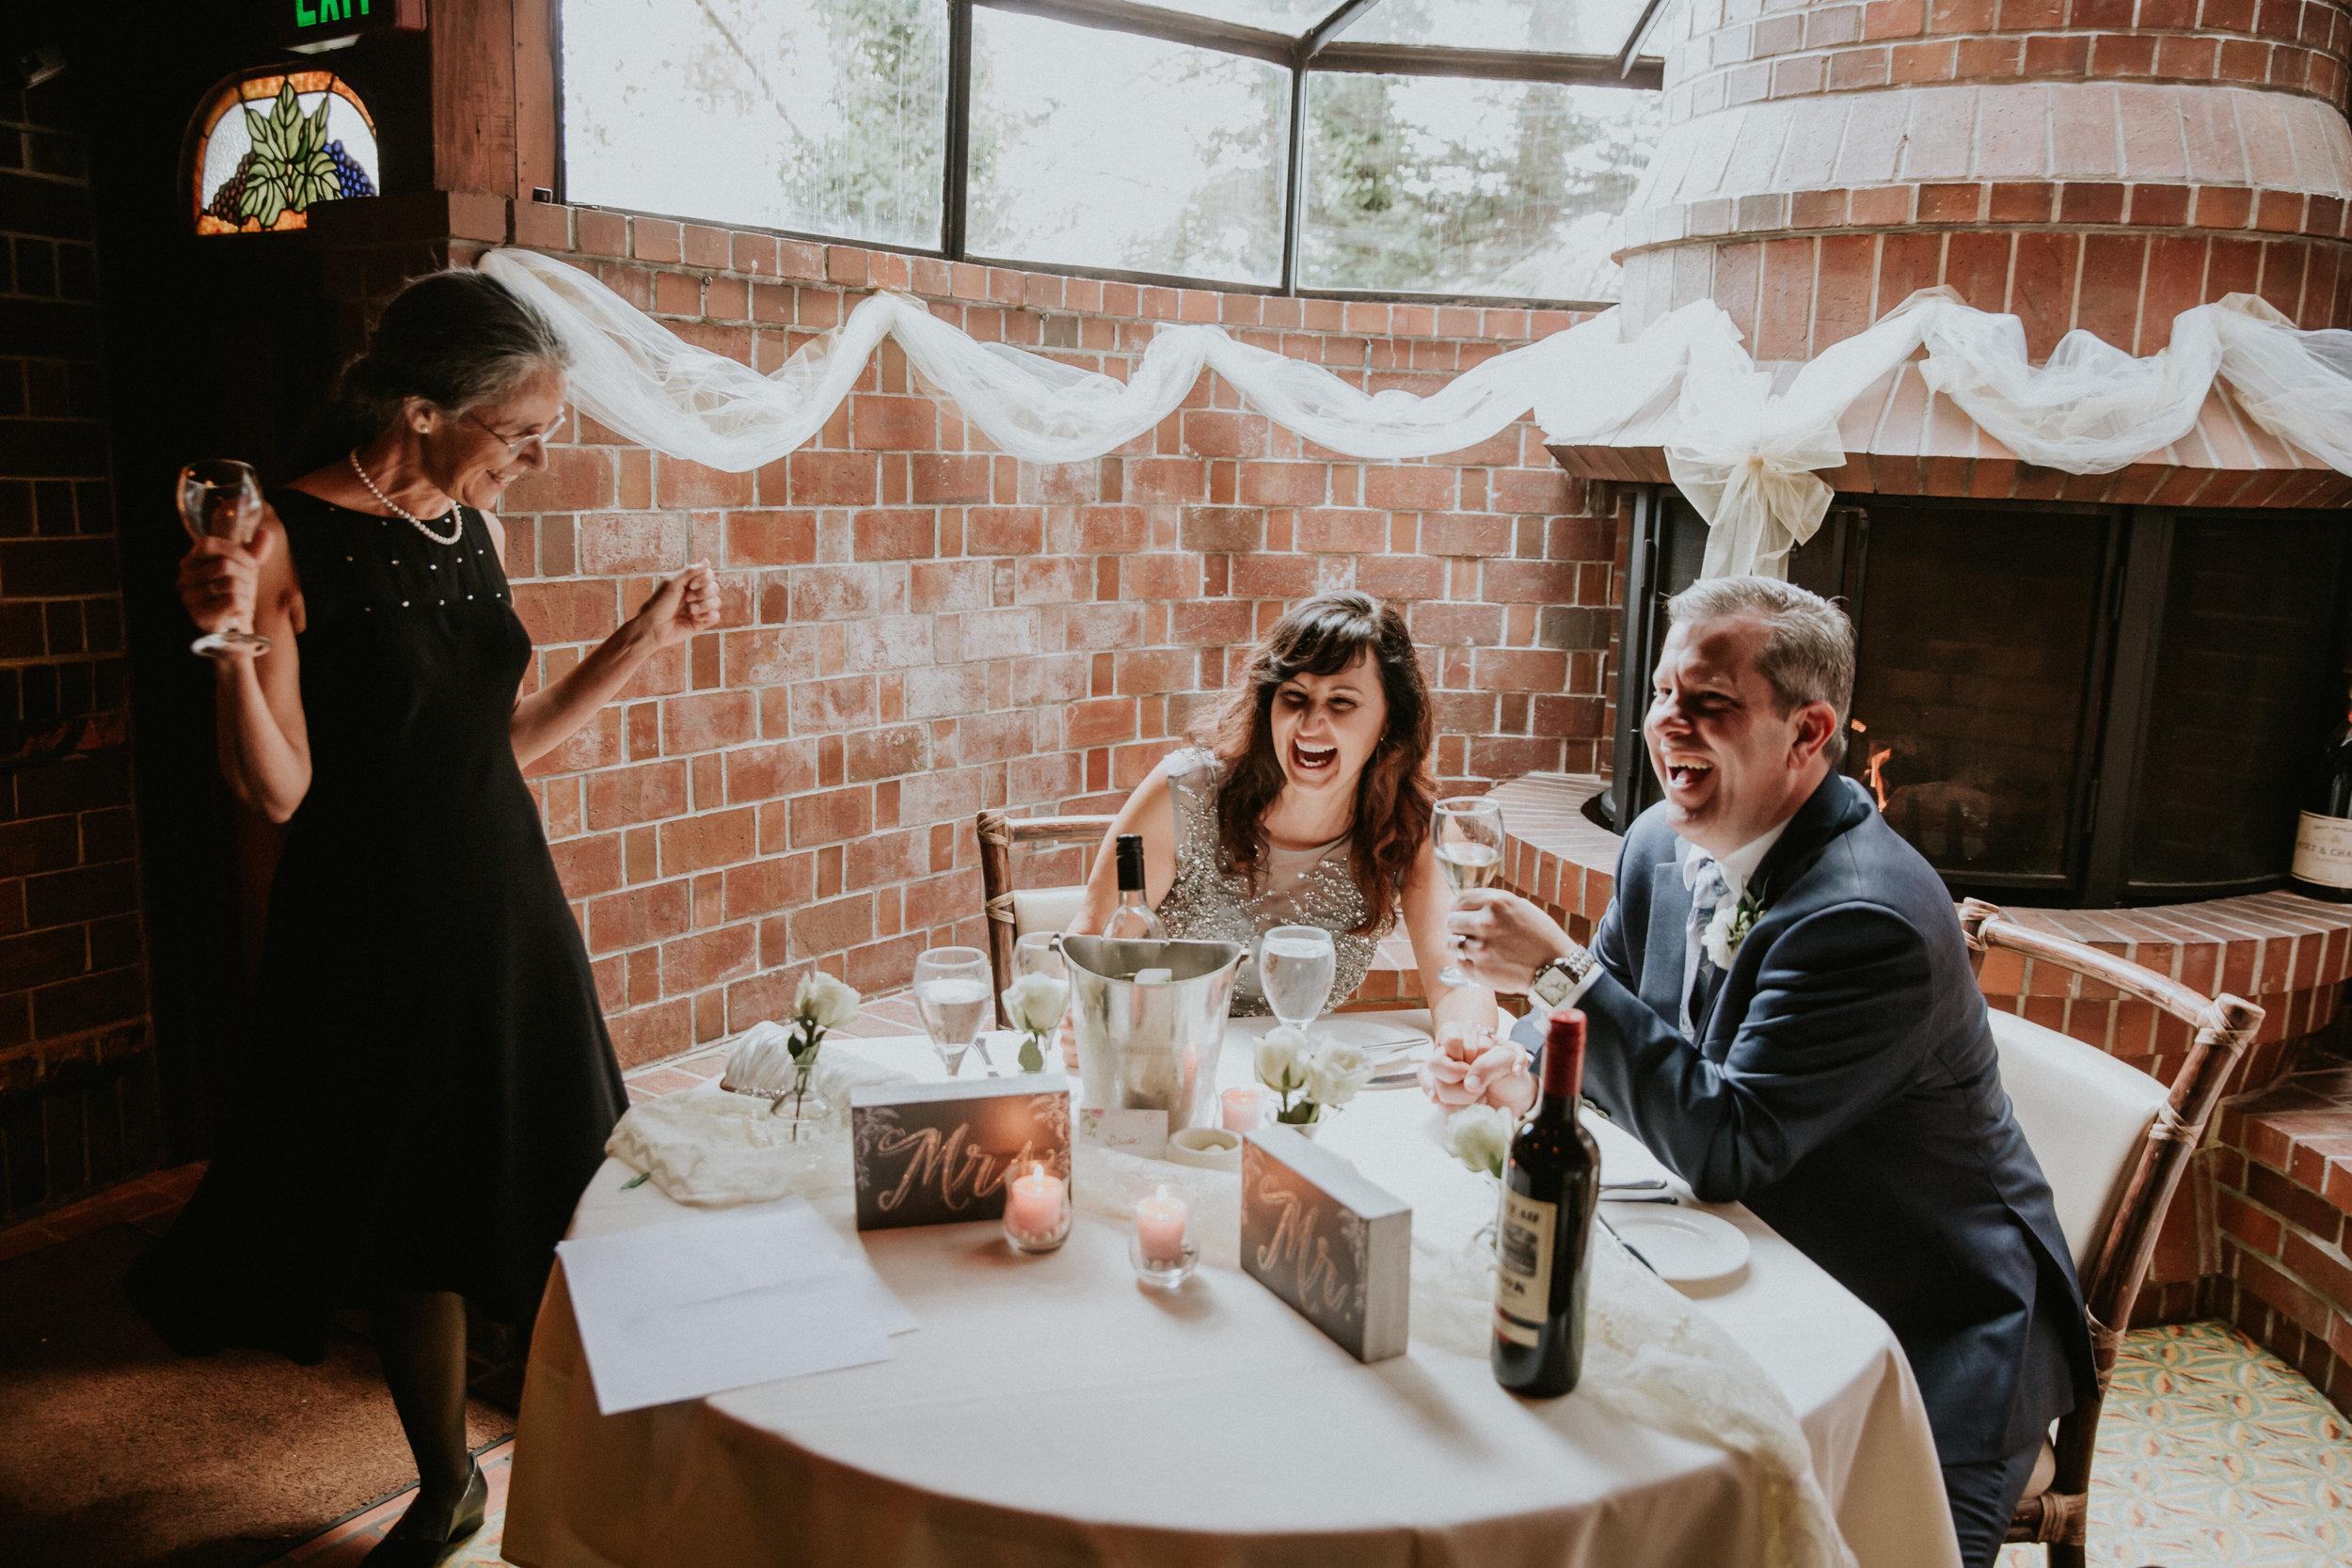 Capitola-Santa-Cruz-wedding-photographer-365.jpg